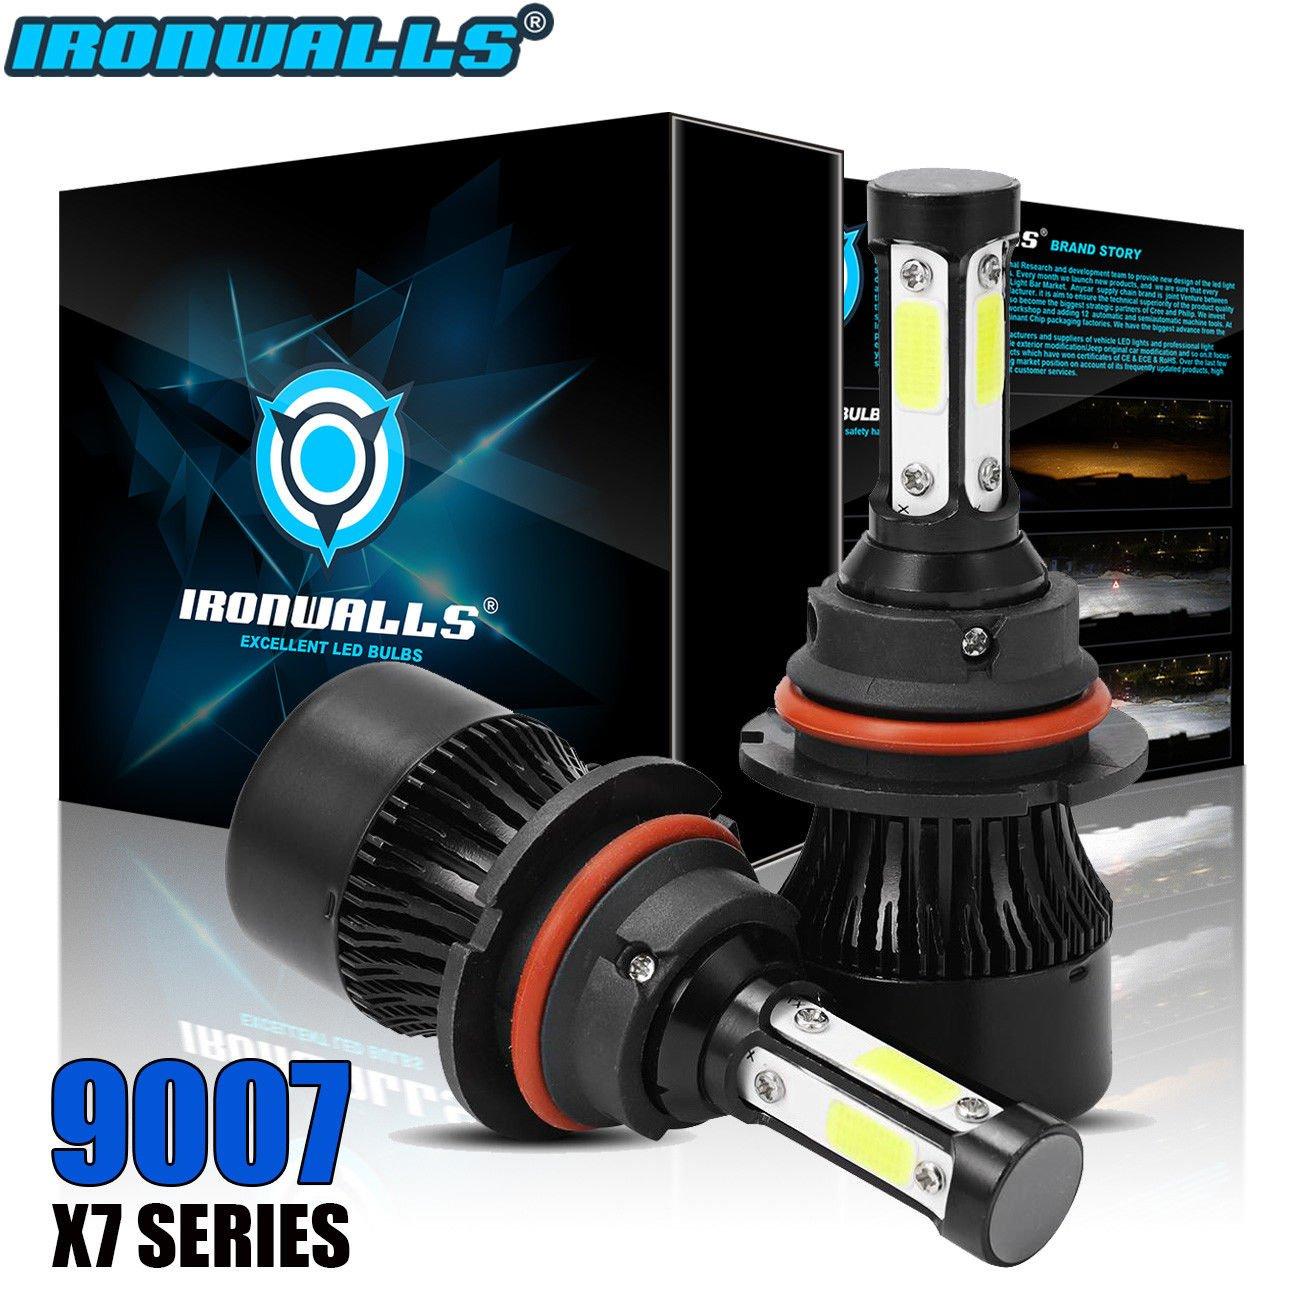 IRONWALLS F-X7 Series 2PCS 9007/HB5 LED Headlight Bulbs All-in-One Conversion Kit Fog Lights 4 sides 72W 8000LM 6500K Super Bright White COB Chips